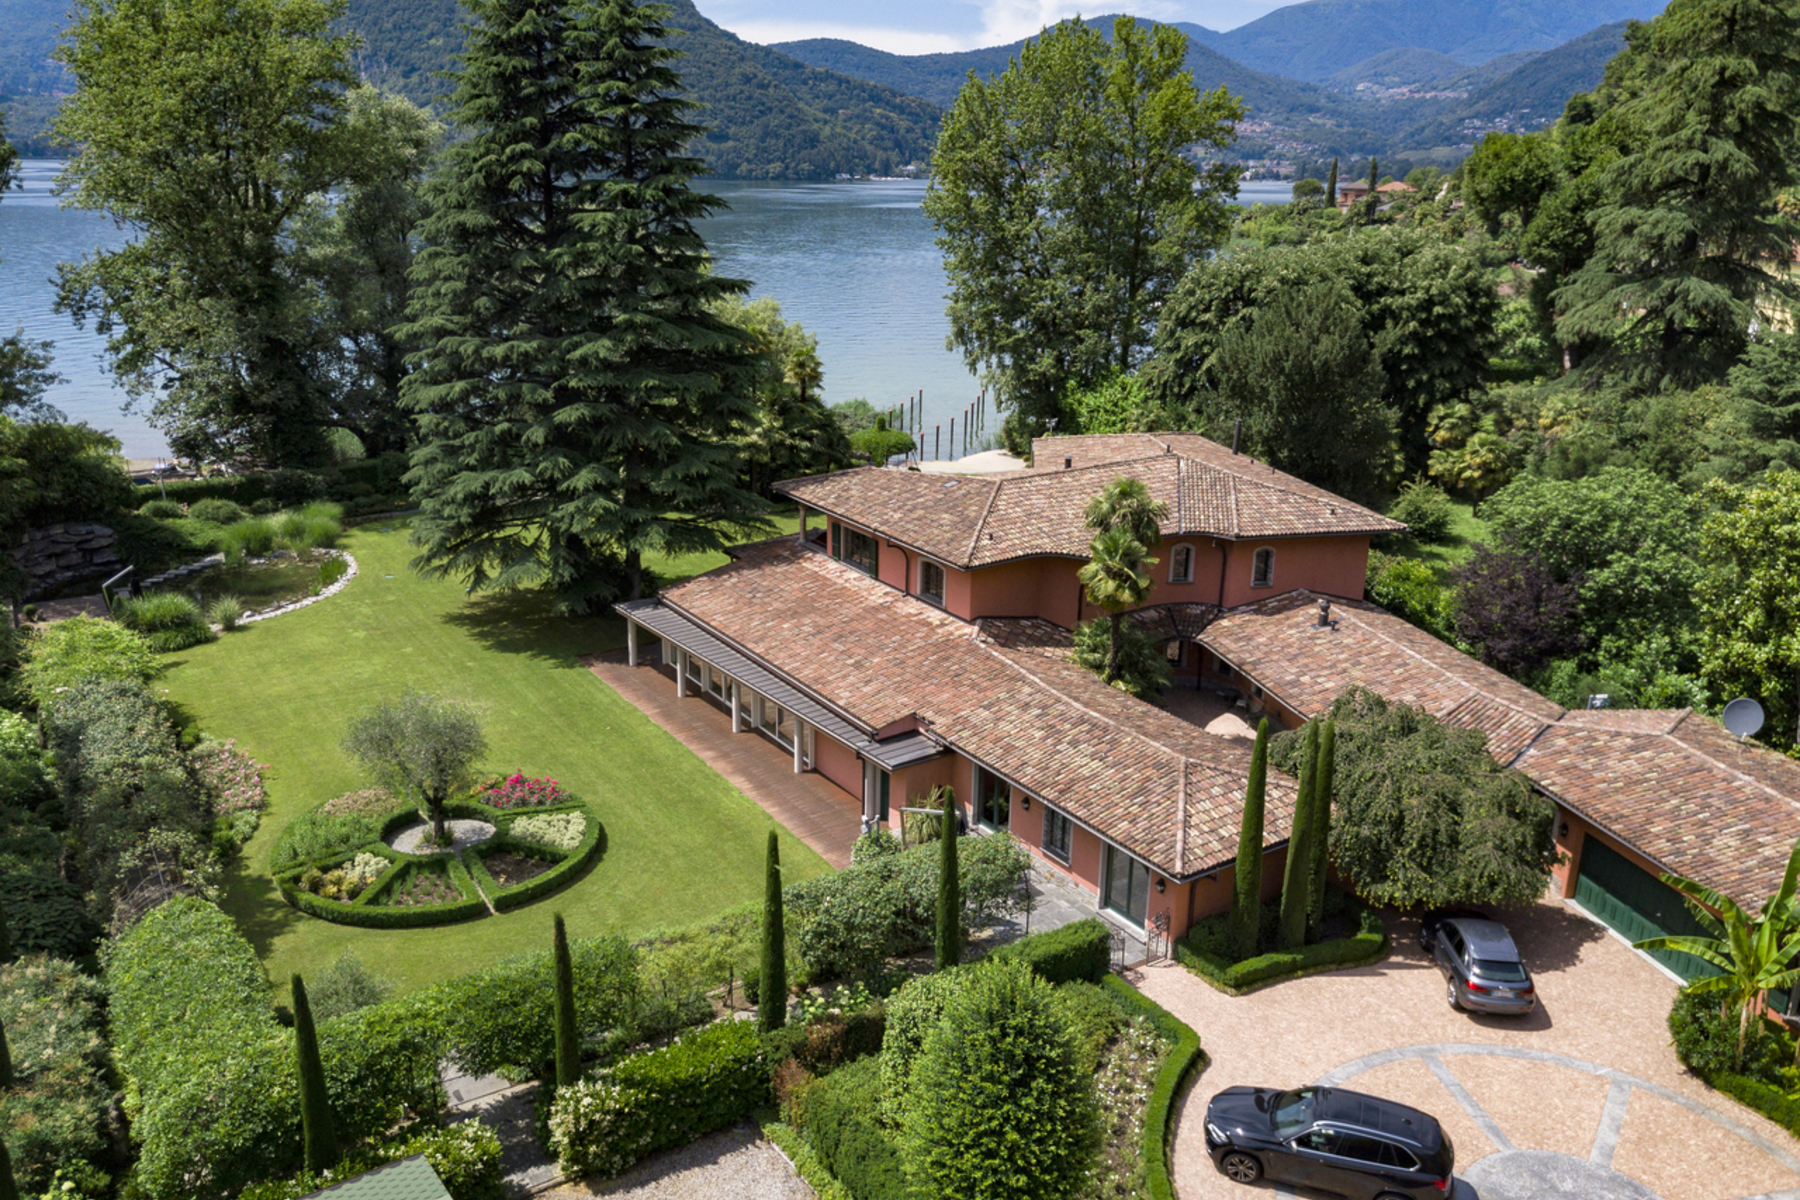 Single Family Homes for Sale at Villa Sandy Lane, directly on the lake Figino Figino, Ticino 6918 Switzerland